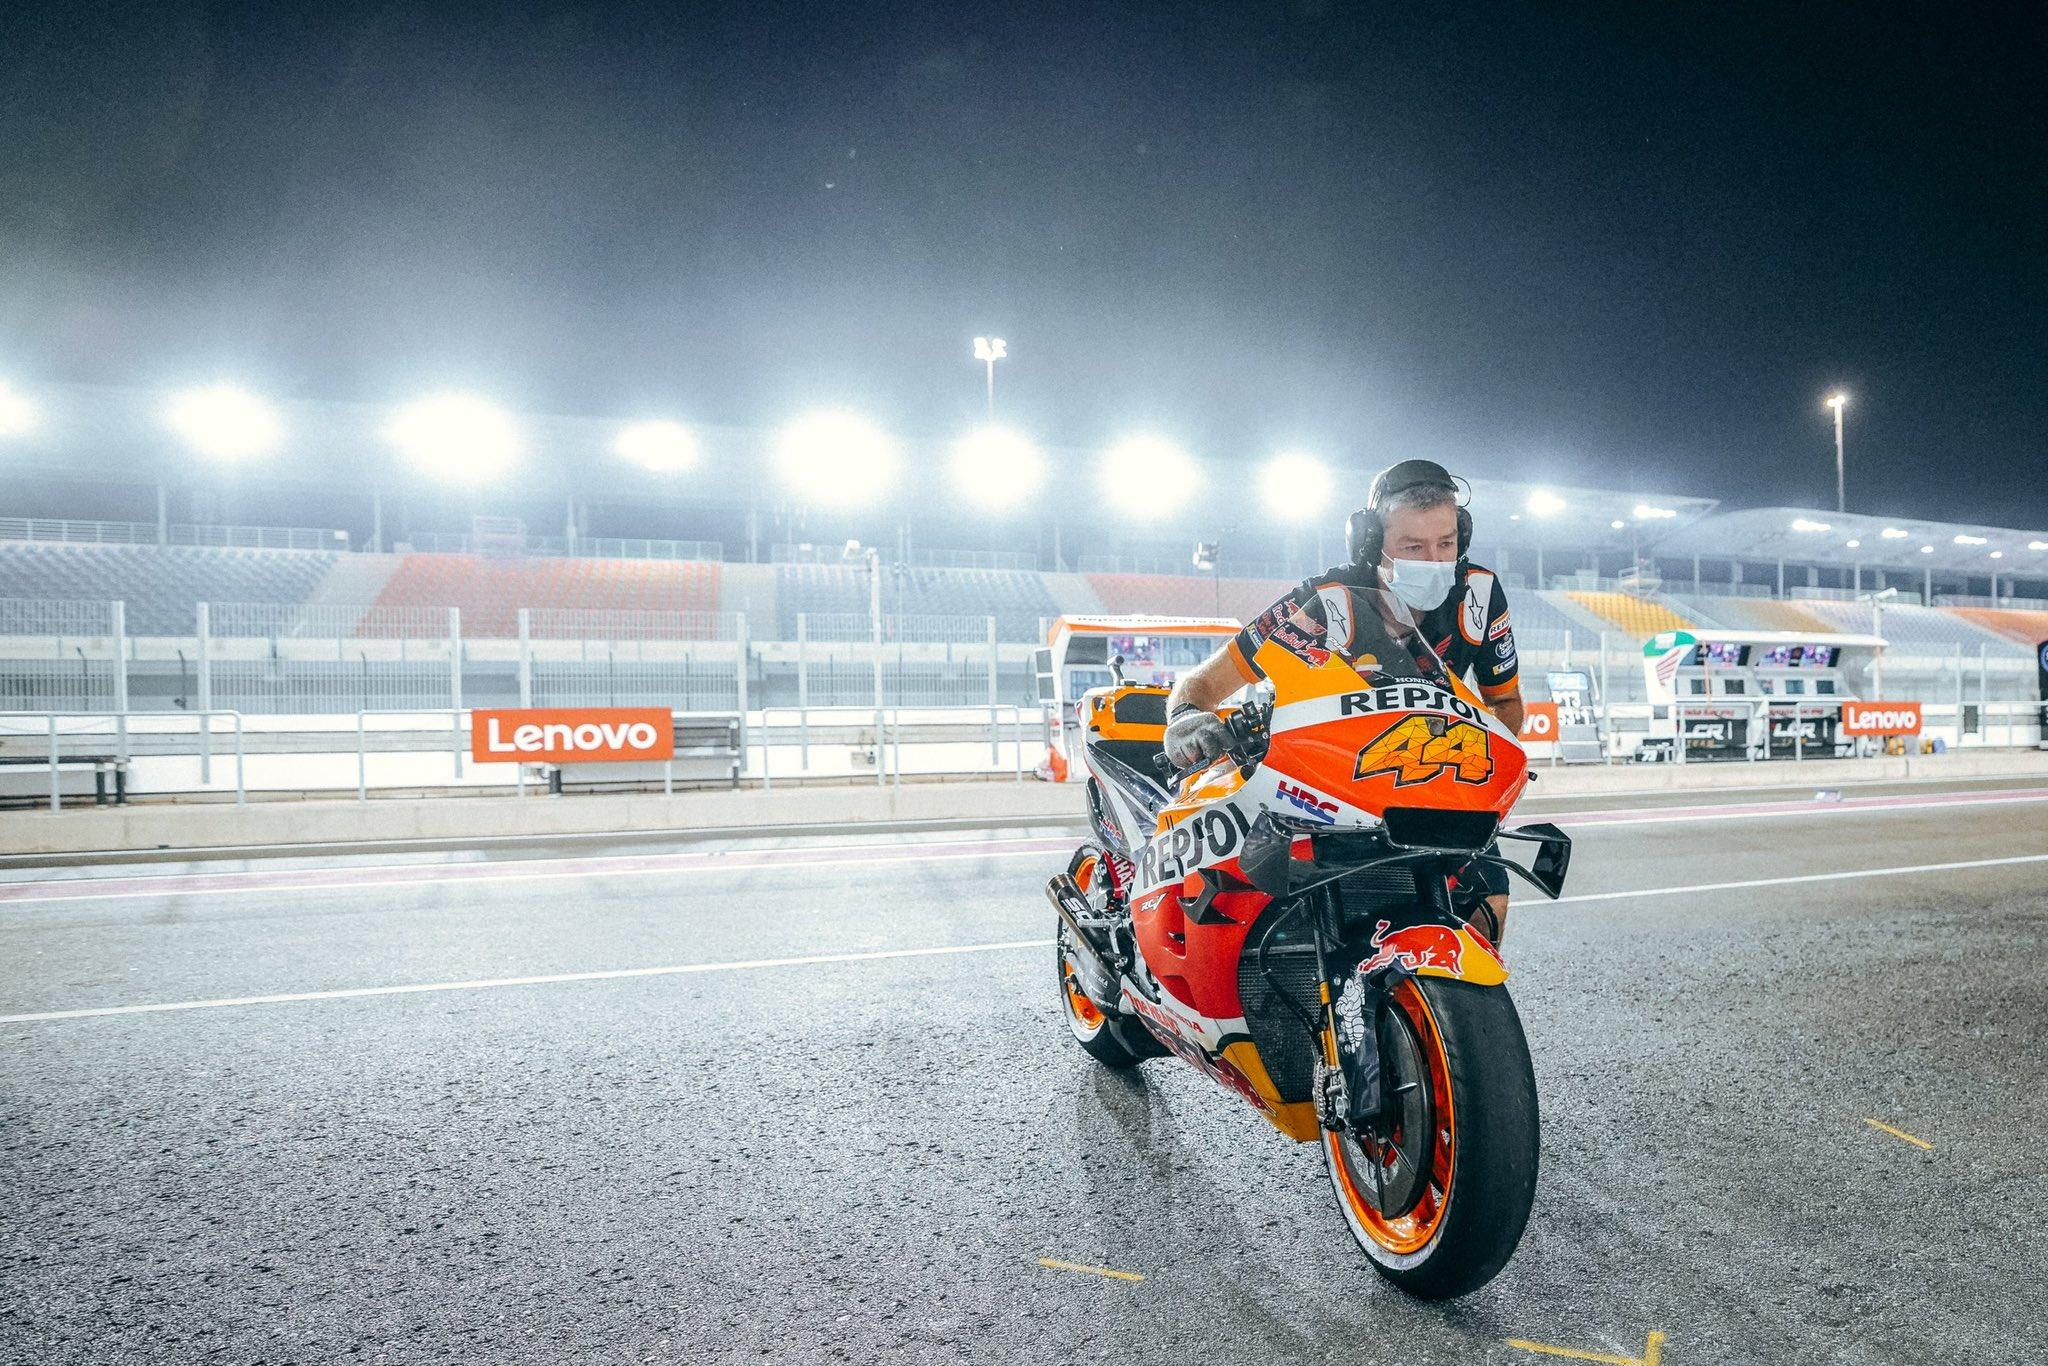 Moto GP 2021 - Page 6 EyJLFsEWUAEFJG_?format=jpg&name=large